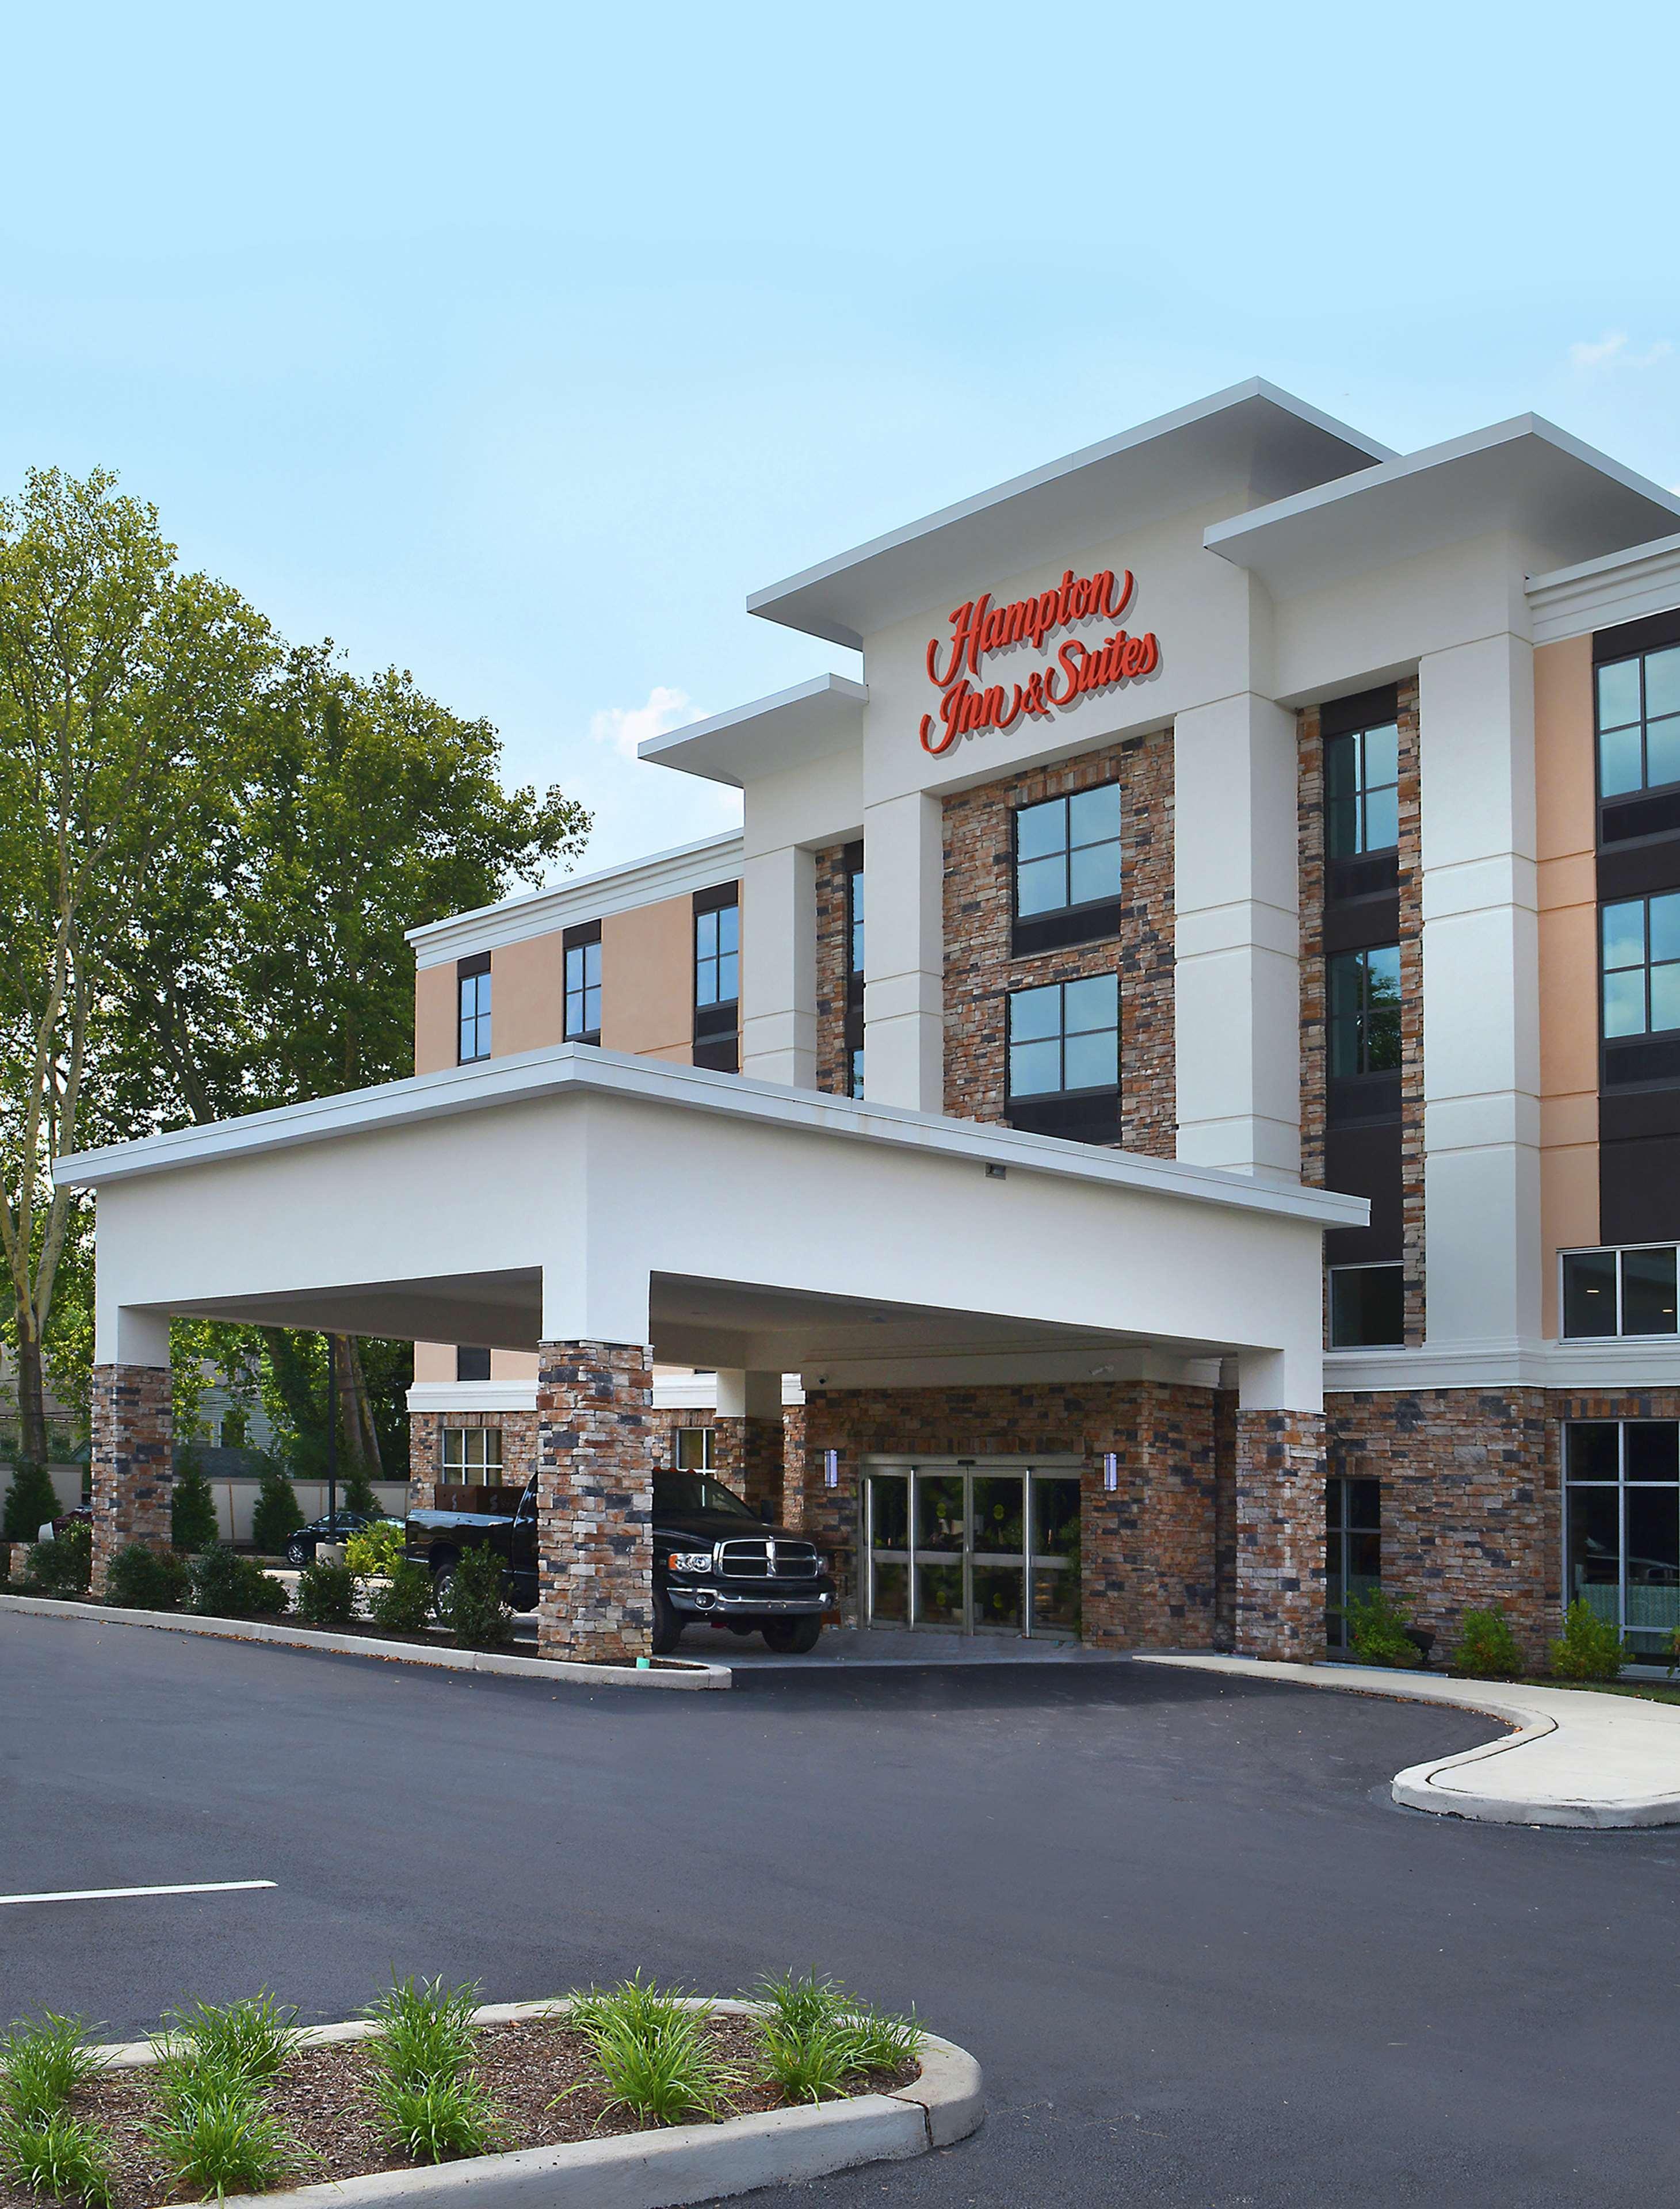 Hampton Inn and Suites Philadelphia/Media, PA, Delaware